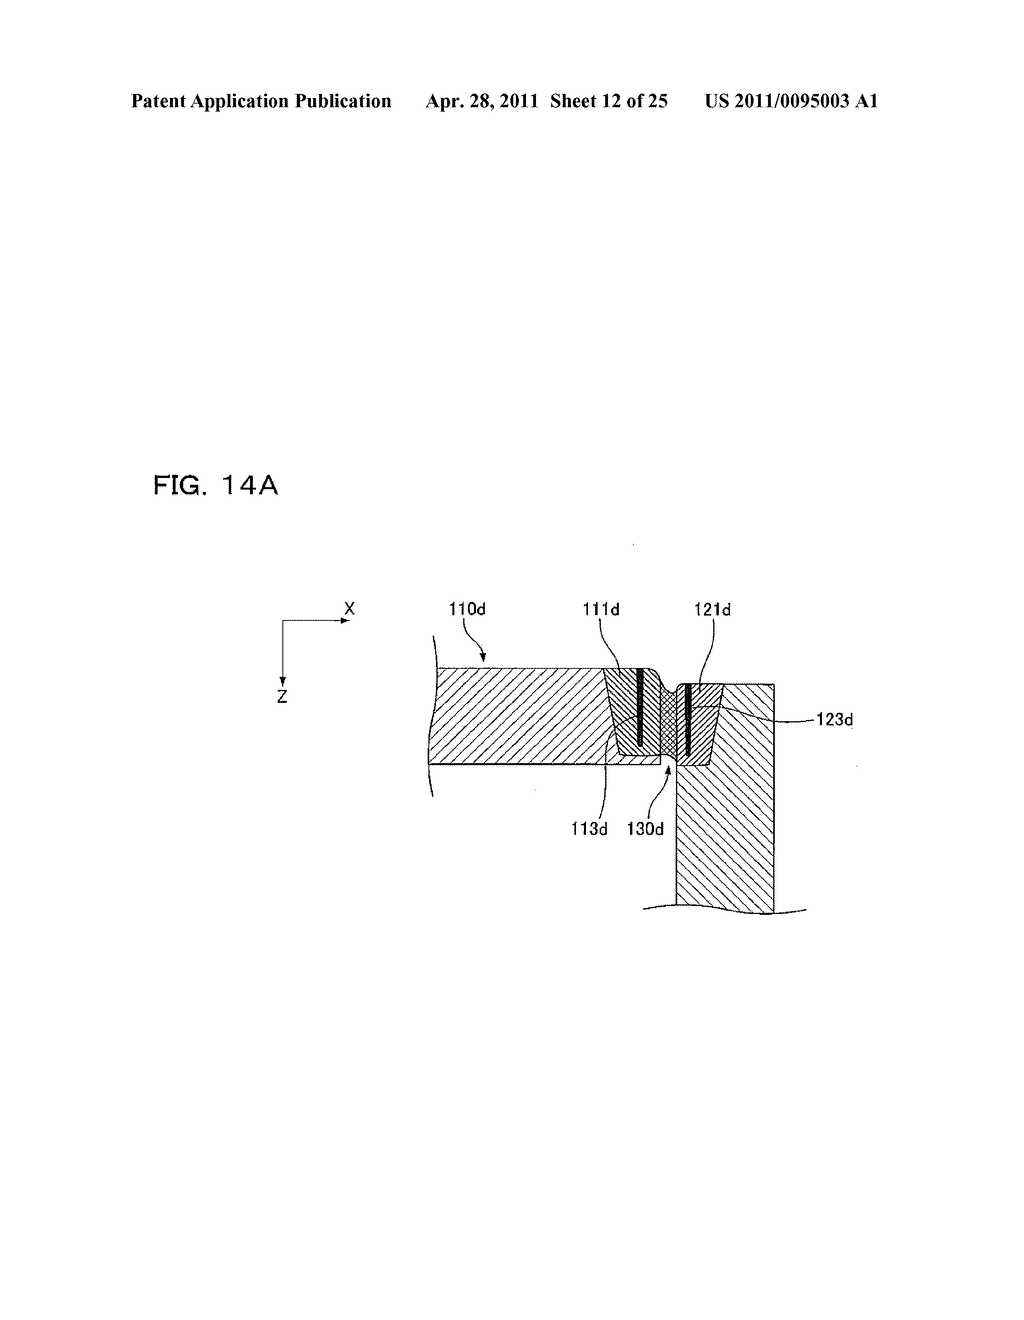 Fusion Welding Diagram Wiring Sample Tig Machine Method And Apparatus Machines